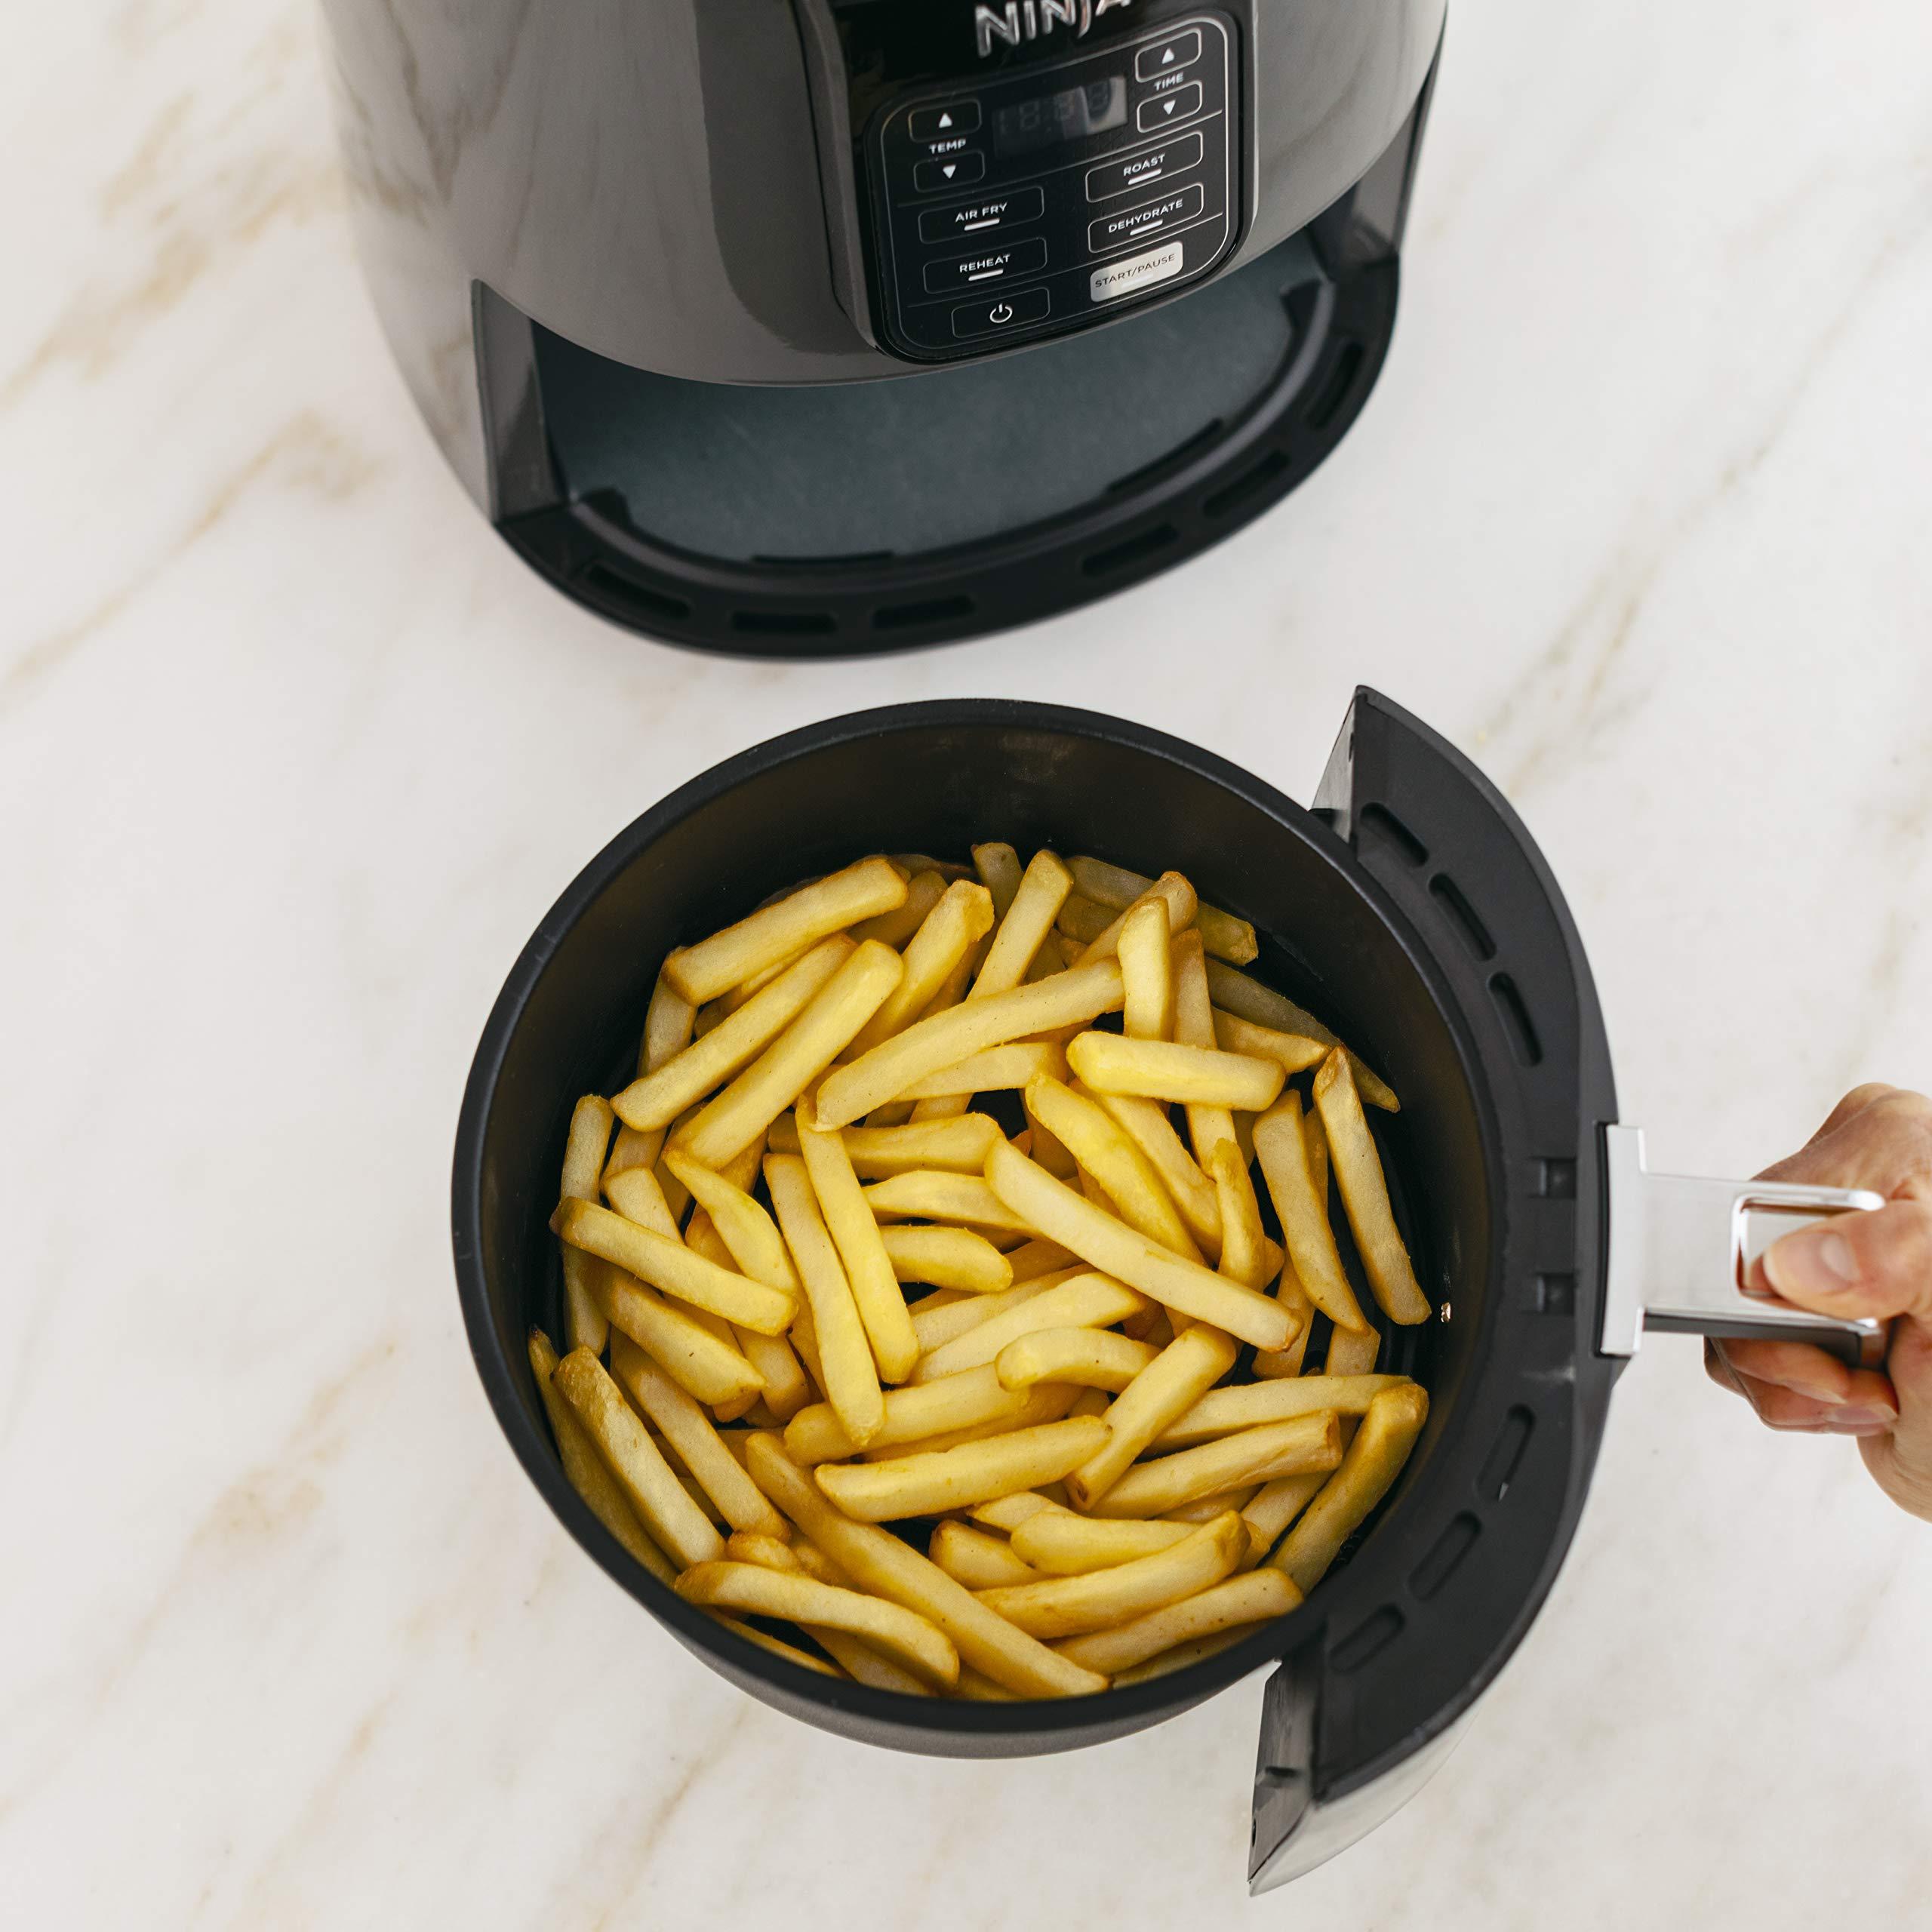 Ninja Air Fryer, 1550-Watt Programmable Base for Air Frying, Roasting, Reheating & Dehydrating with 4-Quart Ceramic Coated Basket (AF101), Black/Gray by Ninja (Image #6)